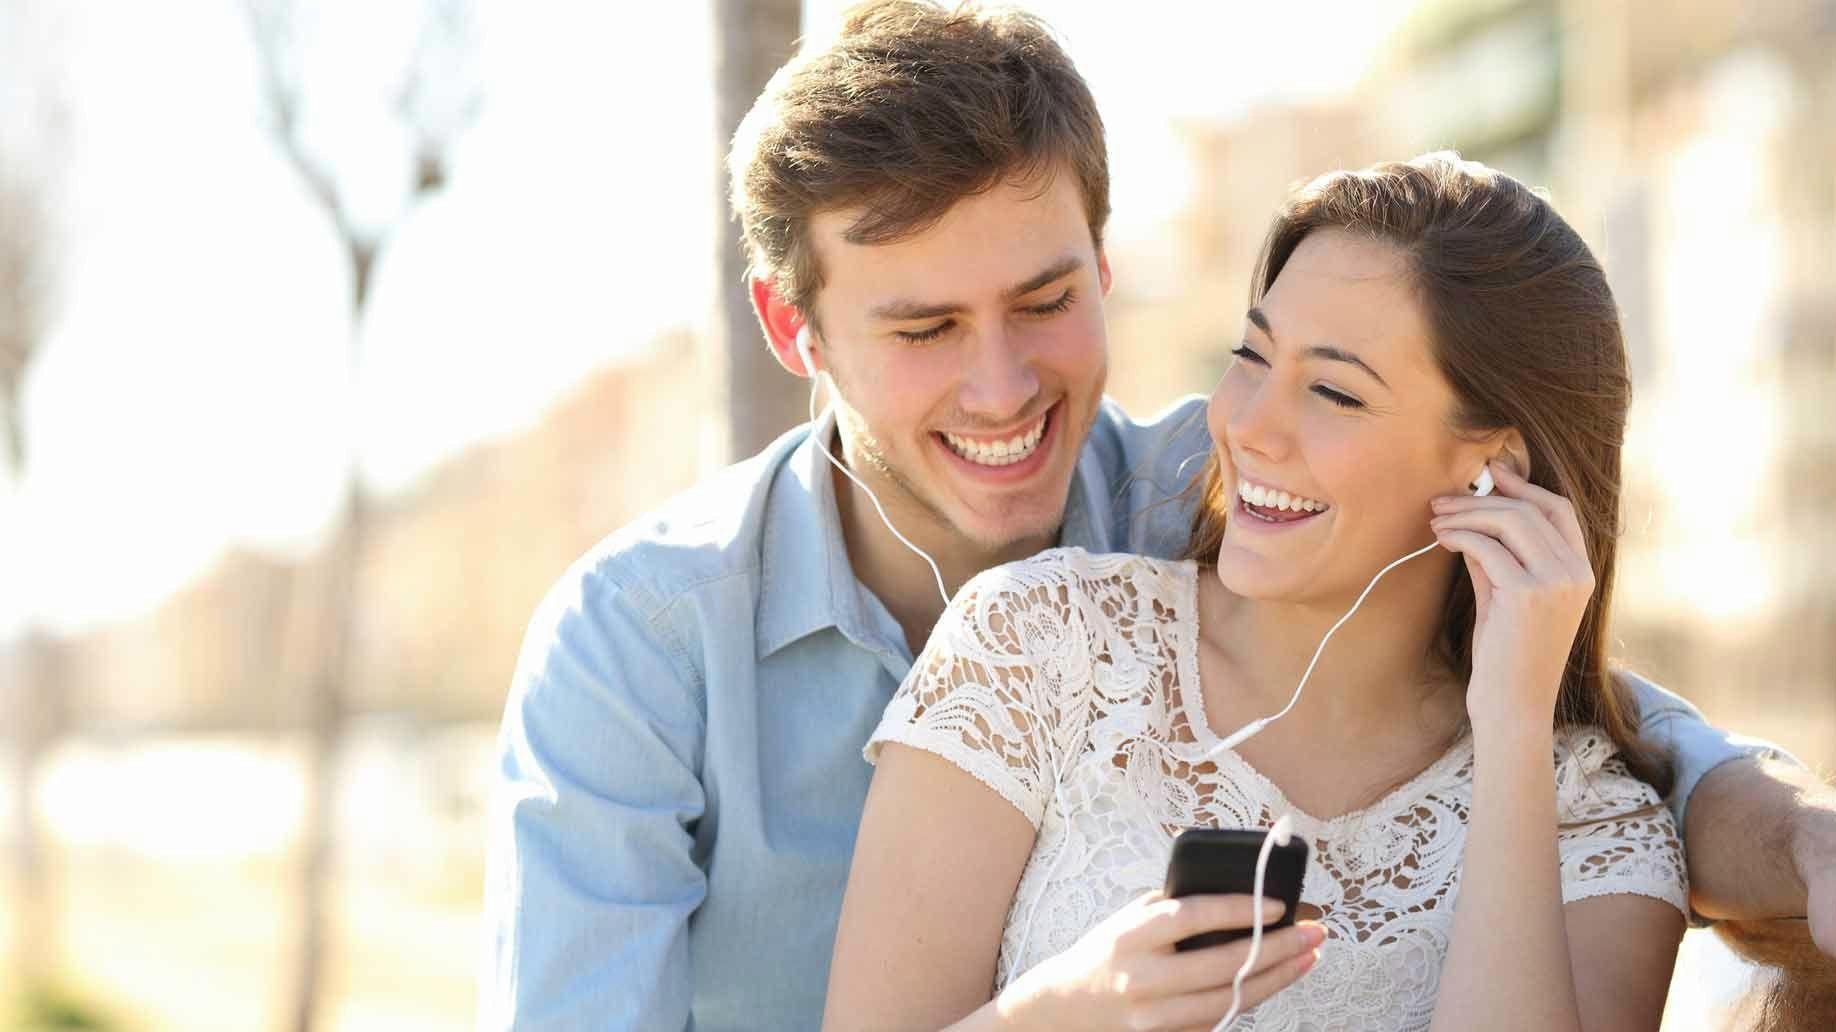 couple-headphones-couple